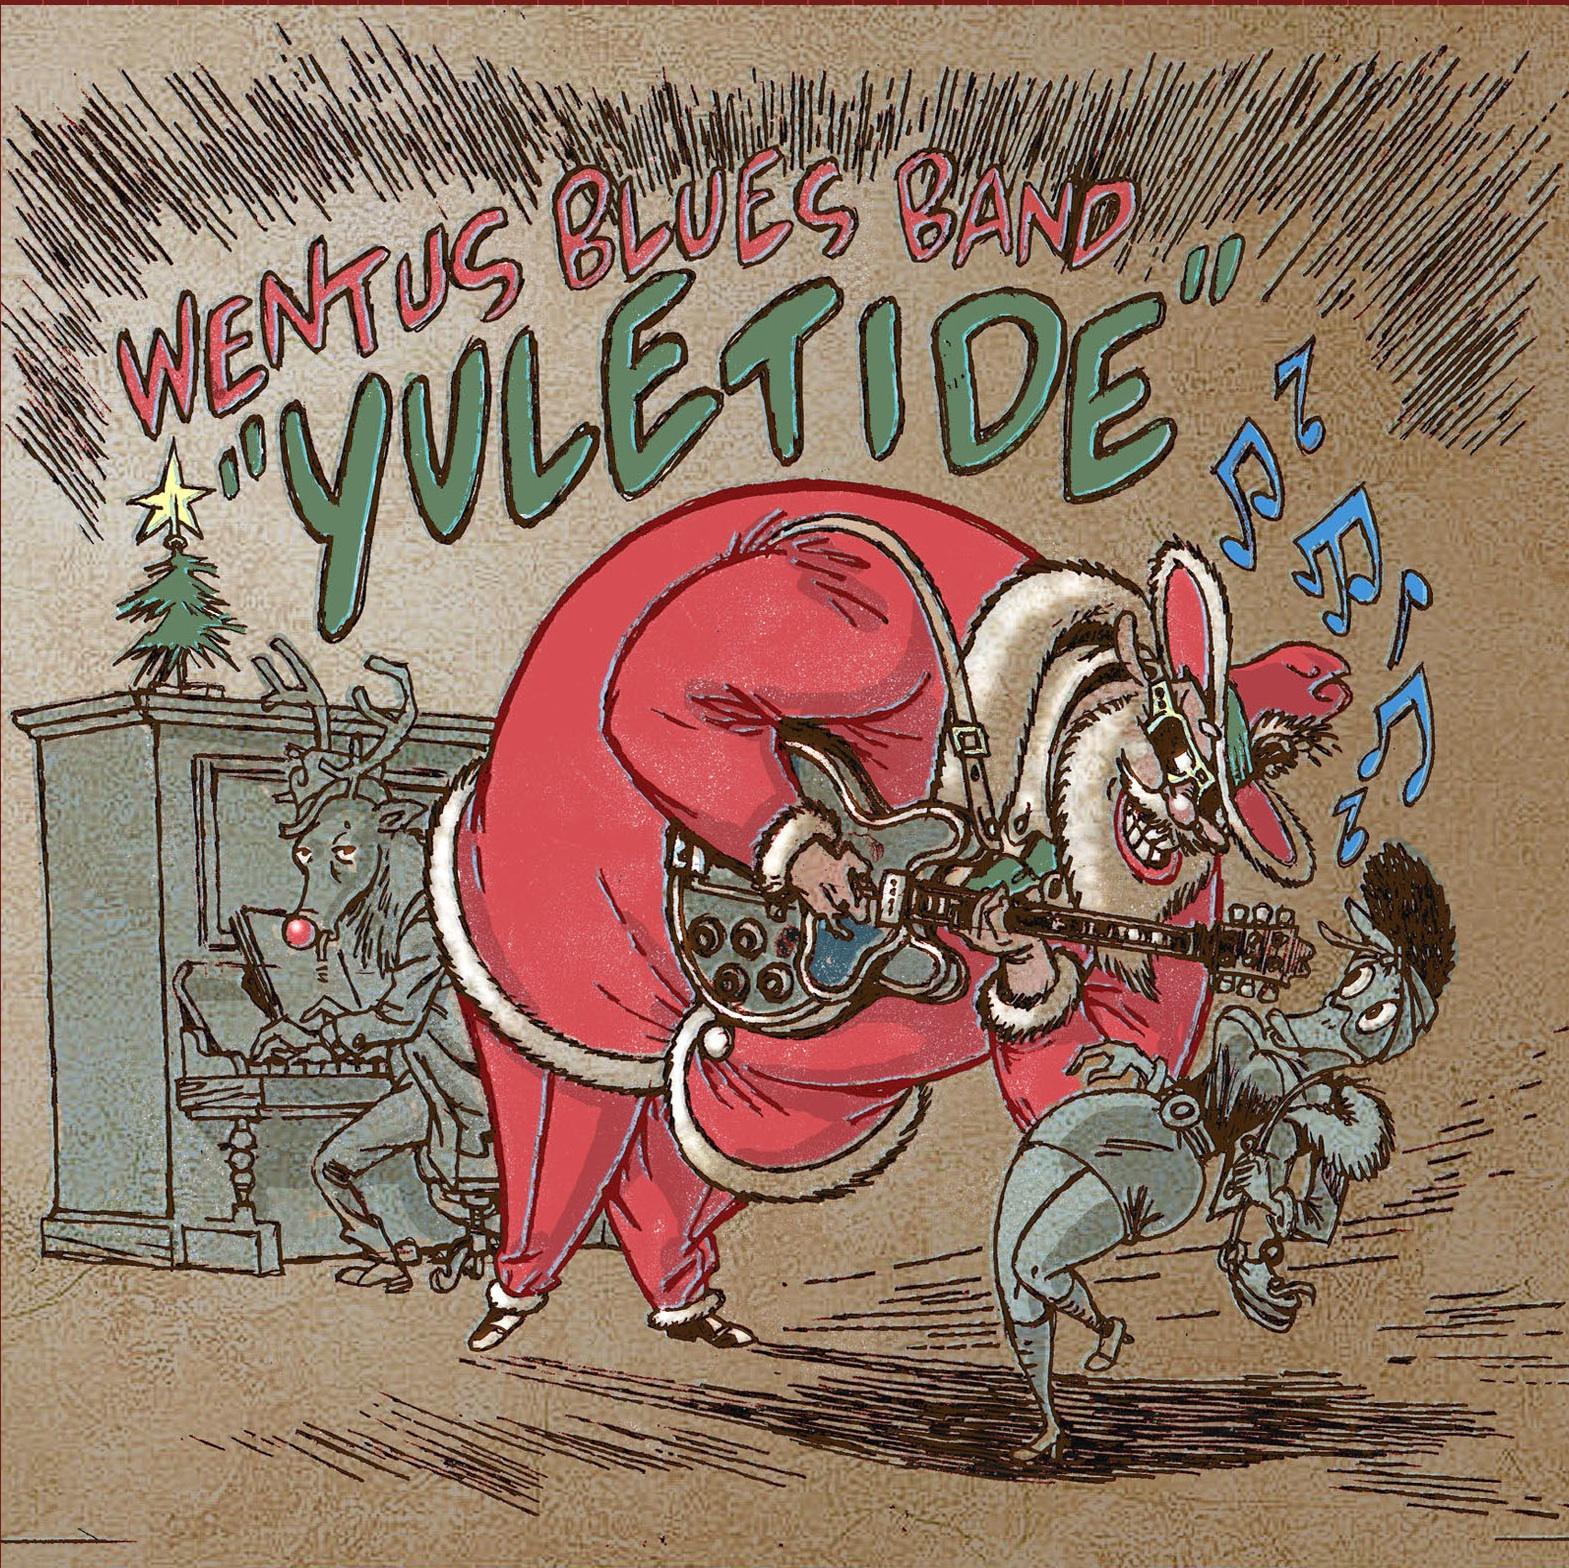 Wentus Blues Band Releases Christmas Album Wentus Blues Band